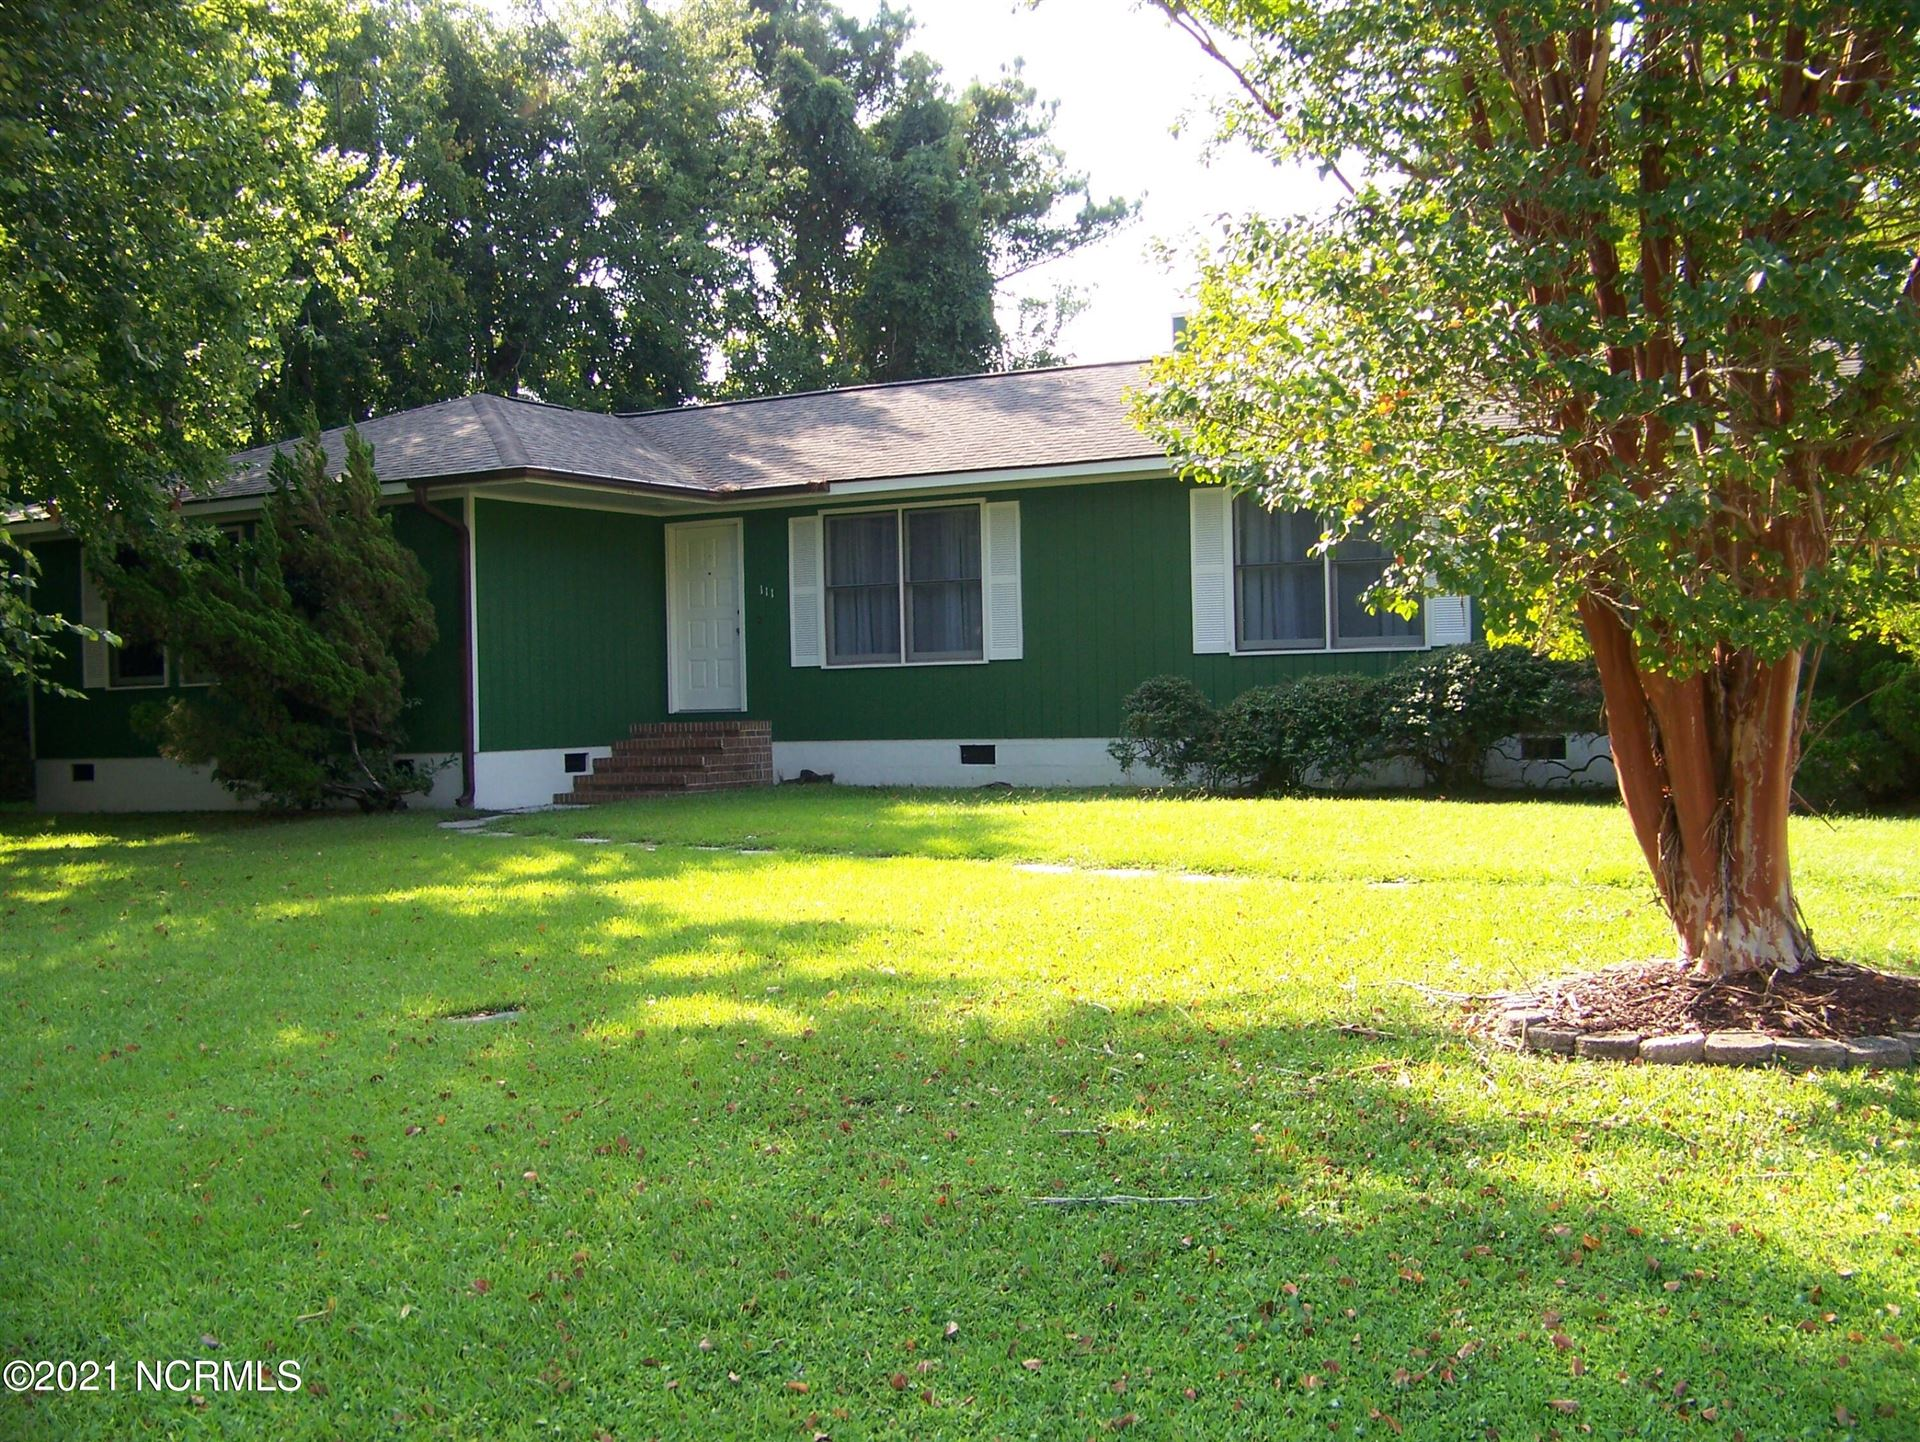 Photo of 111 Tree Fern Drive, Morehead City, NC 28557 (MLS # 100290931)